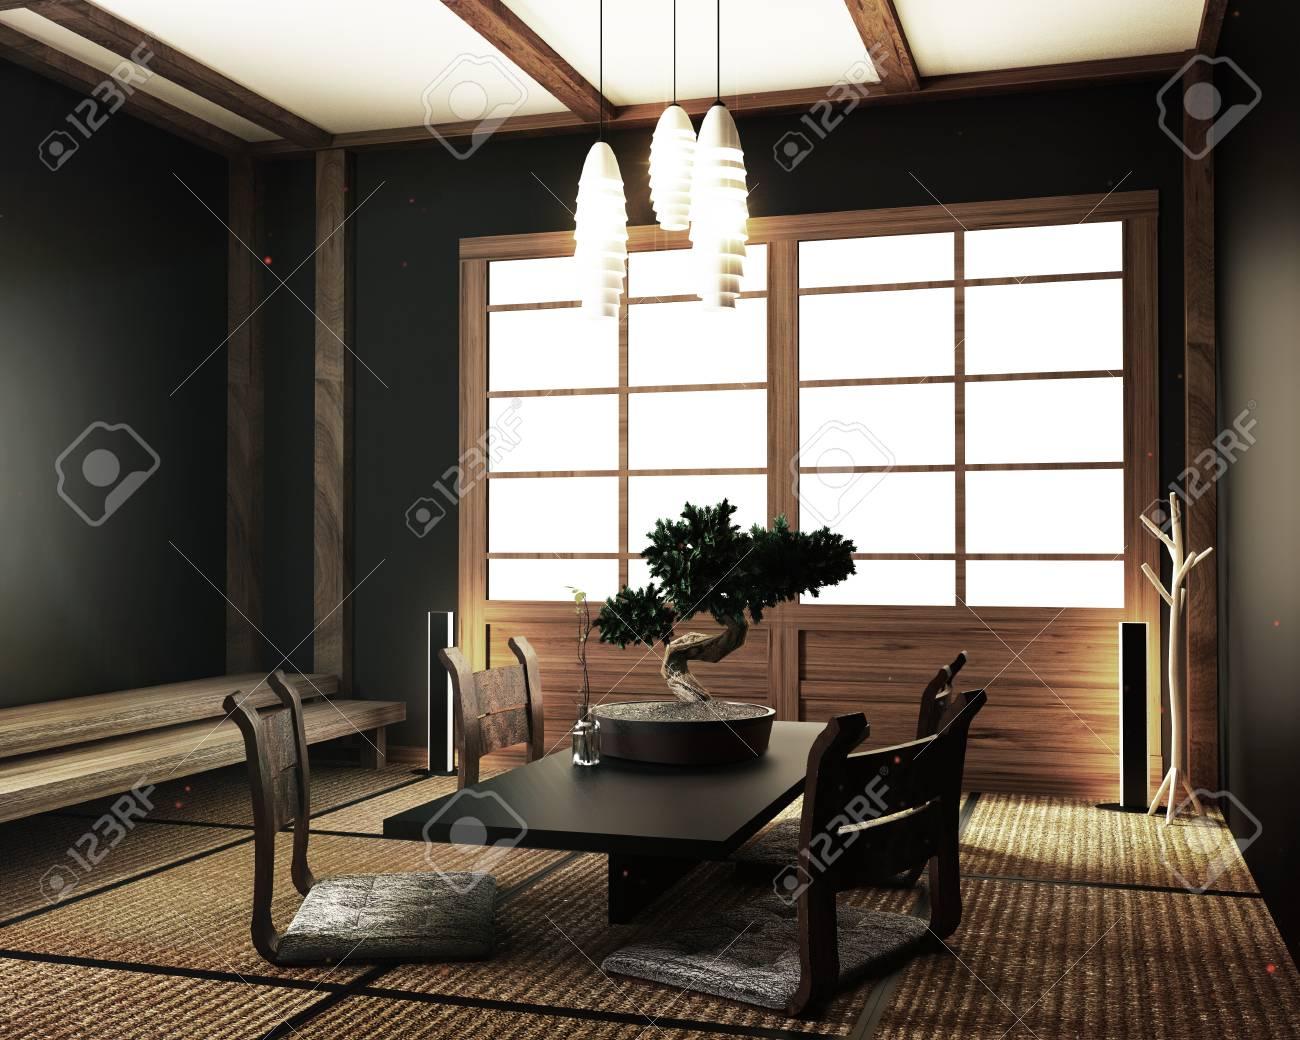 interior design,modern living room with table katana sword lamp..